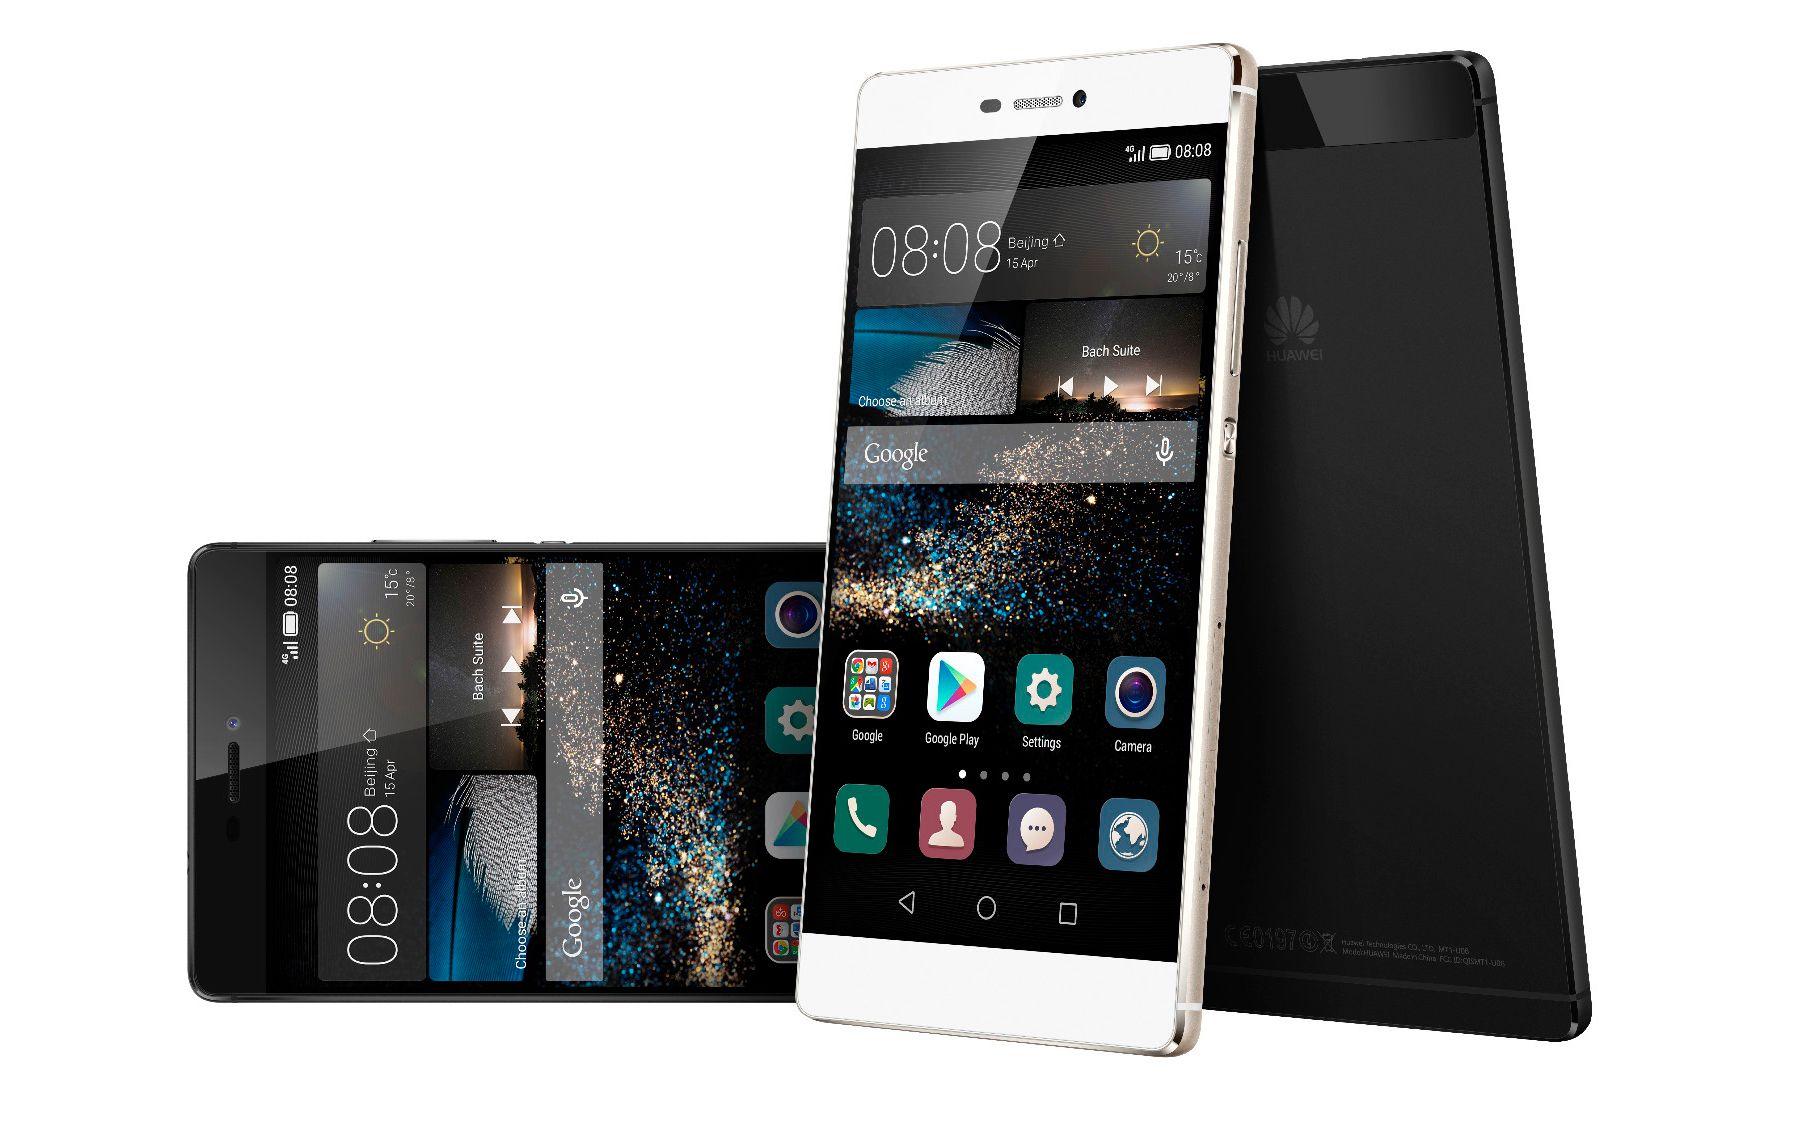 Huawei P8 e P8 Lite prezzo